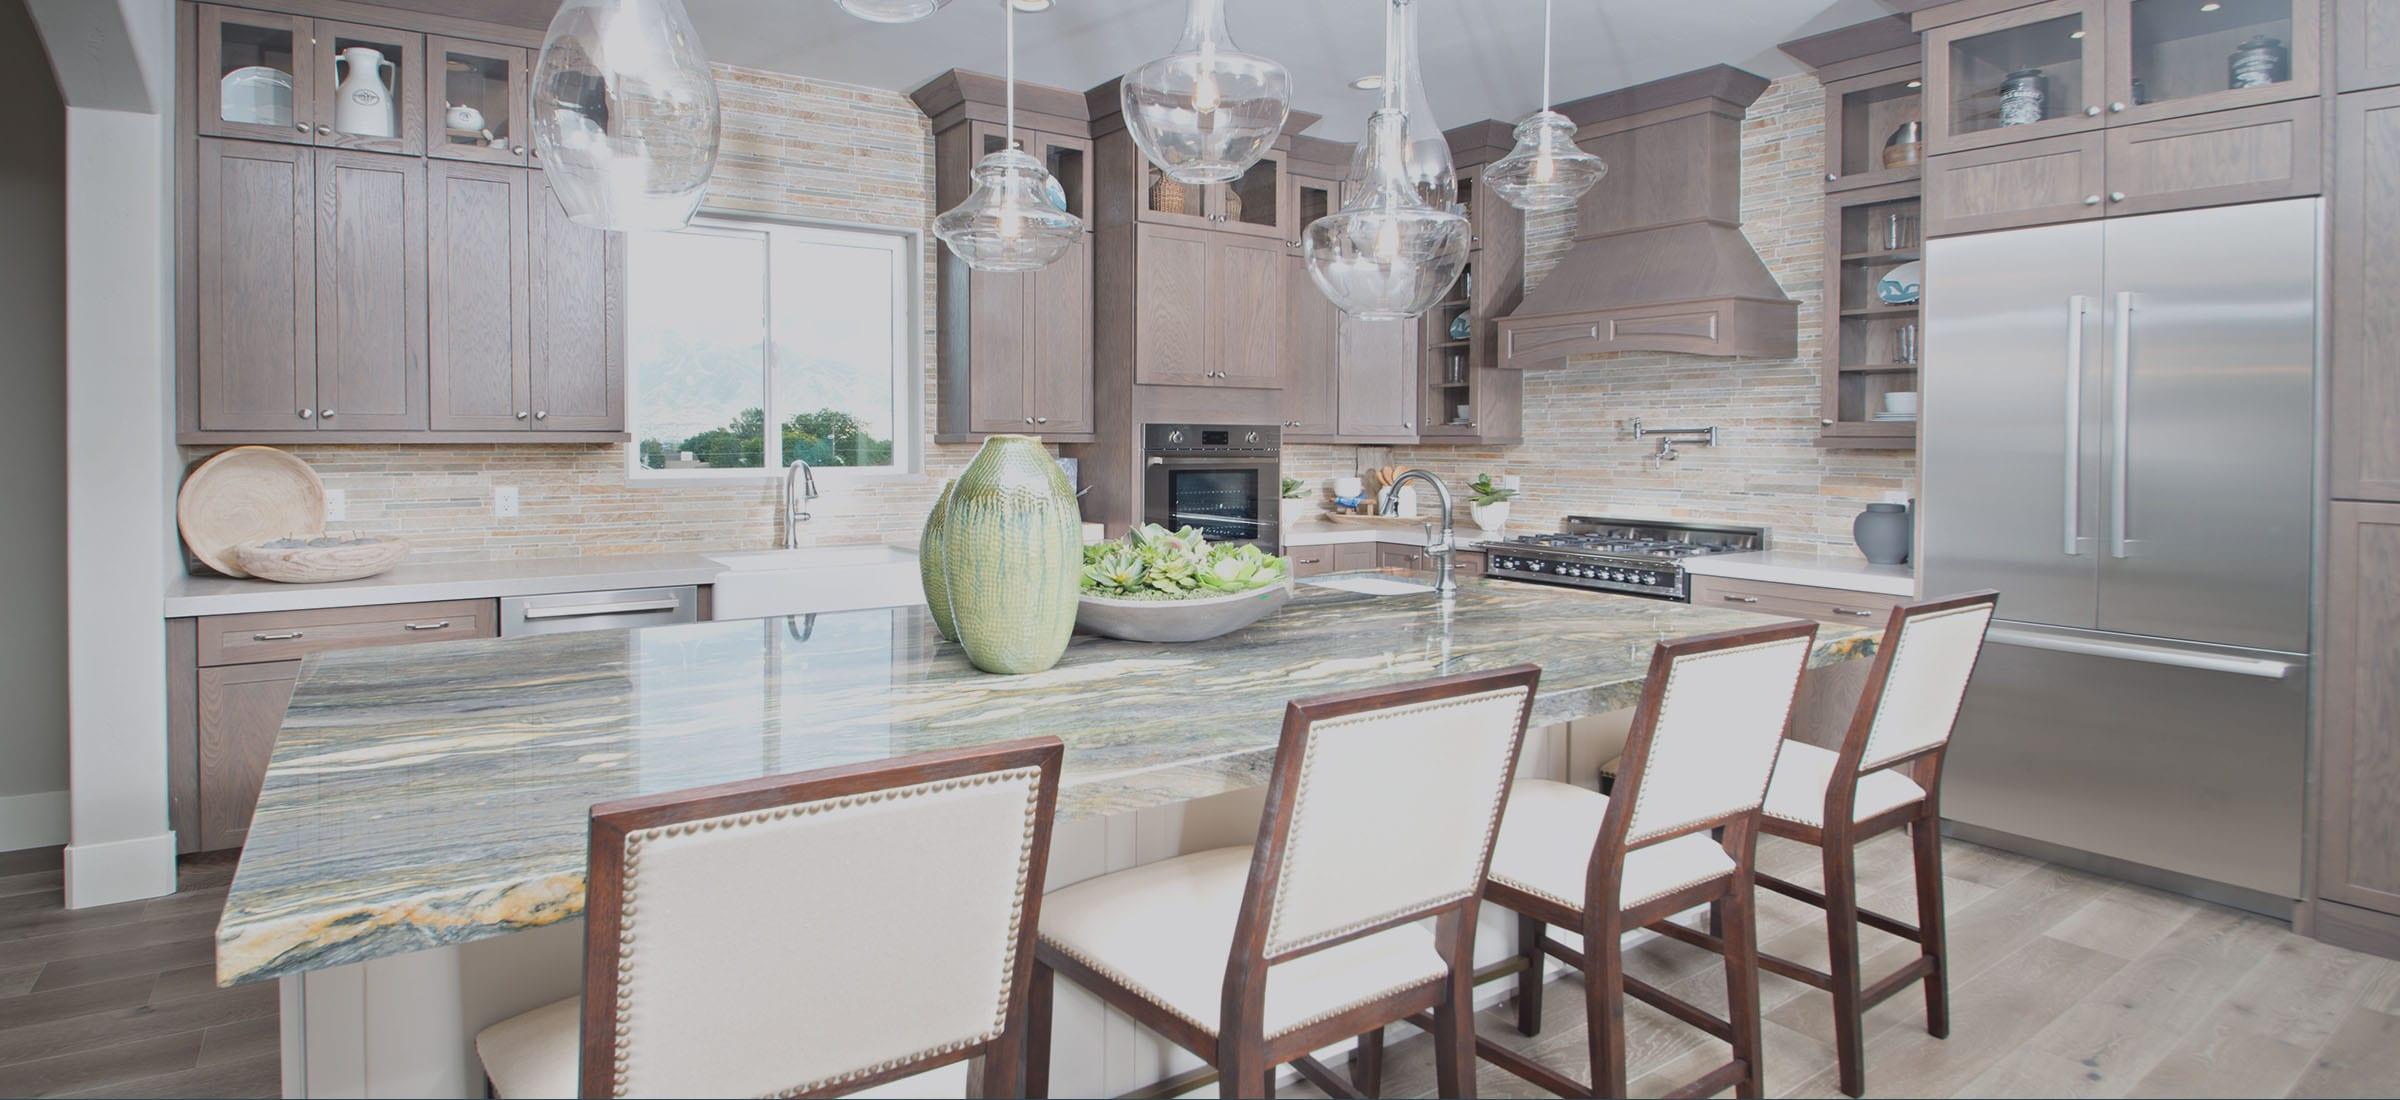 Peachy Chris Dicks An Ilg Company Utahs Cabinets And Home Interior And Landscaping Ologienasavecom